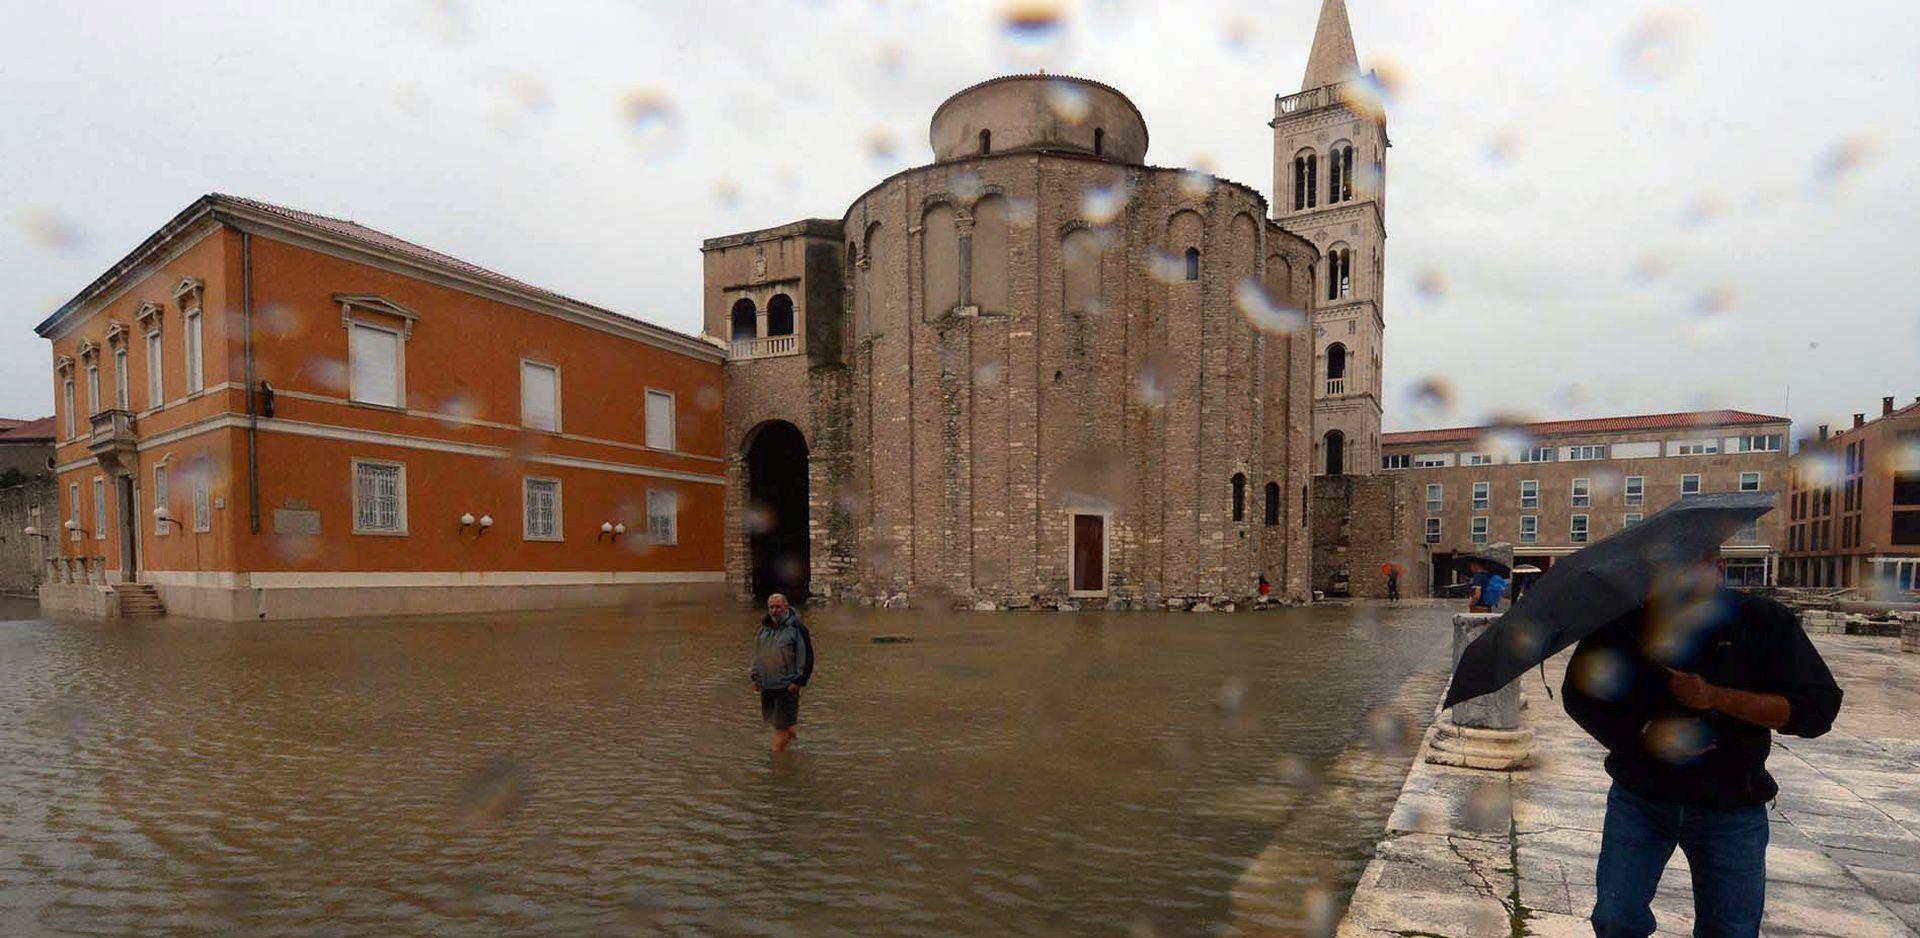 Zadarski Stožer: 70 timova vatrogasaca i HV-a crpe vodu iz poplavljenih objekata